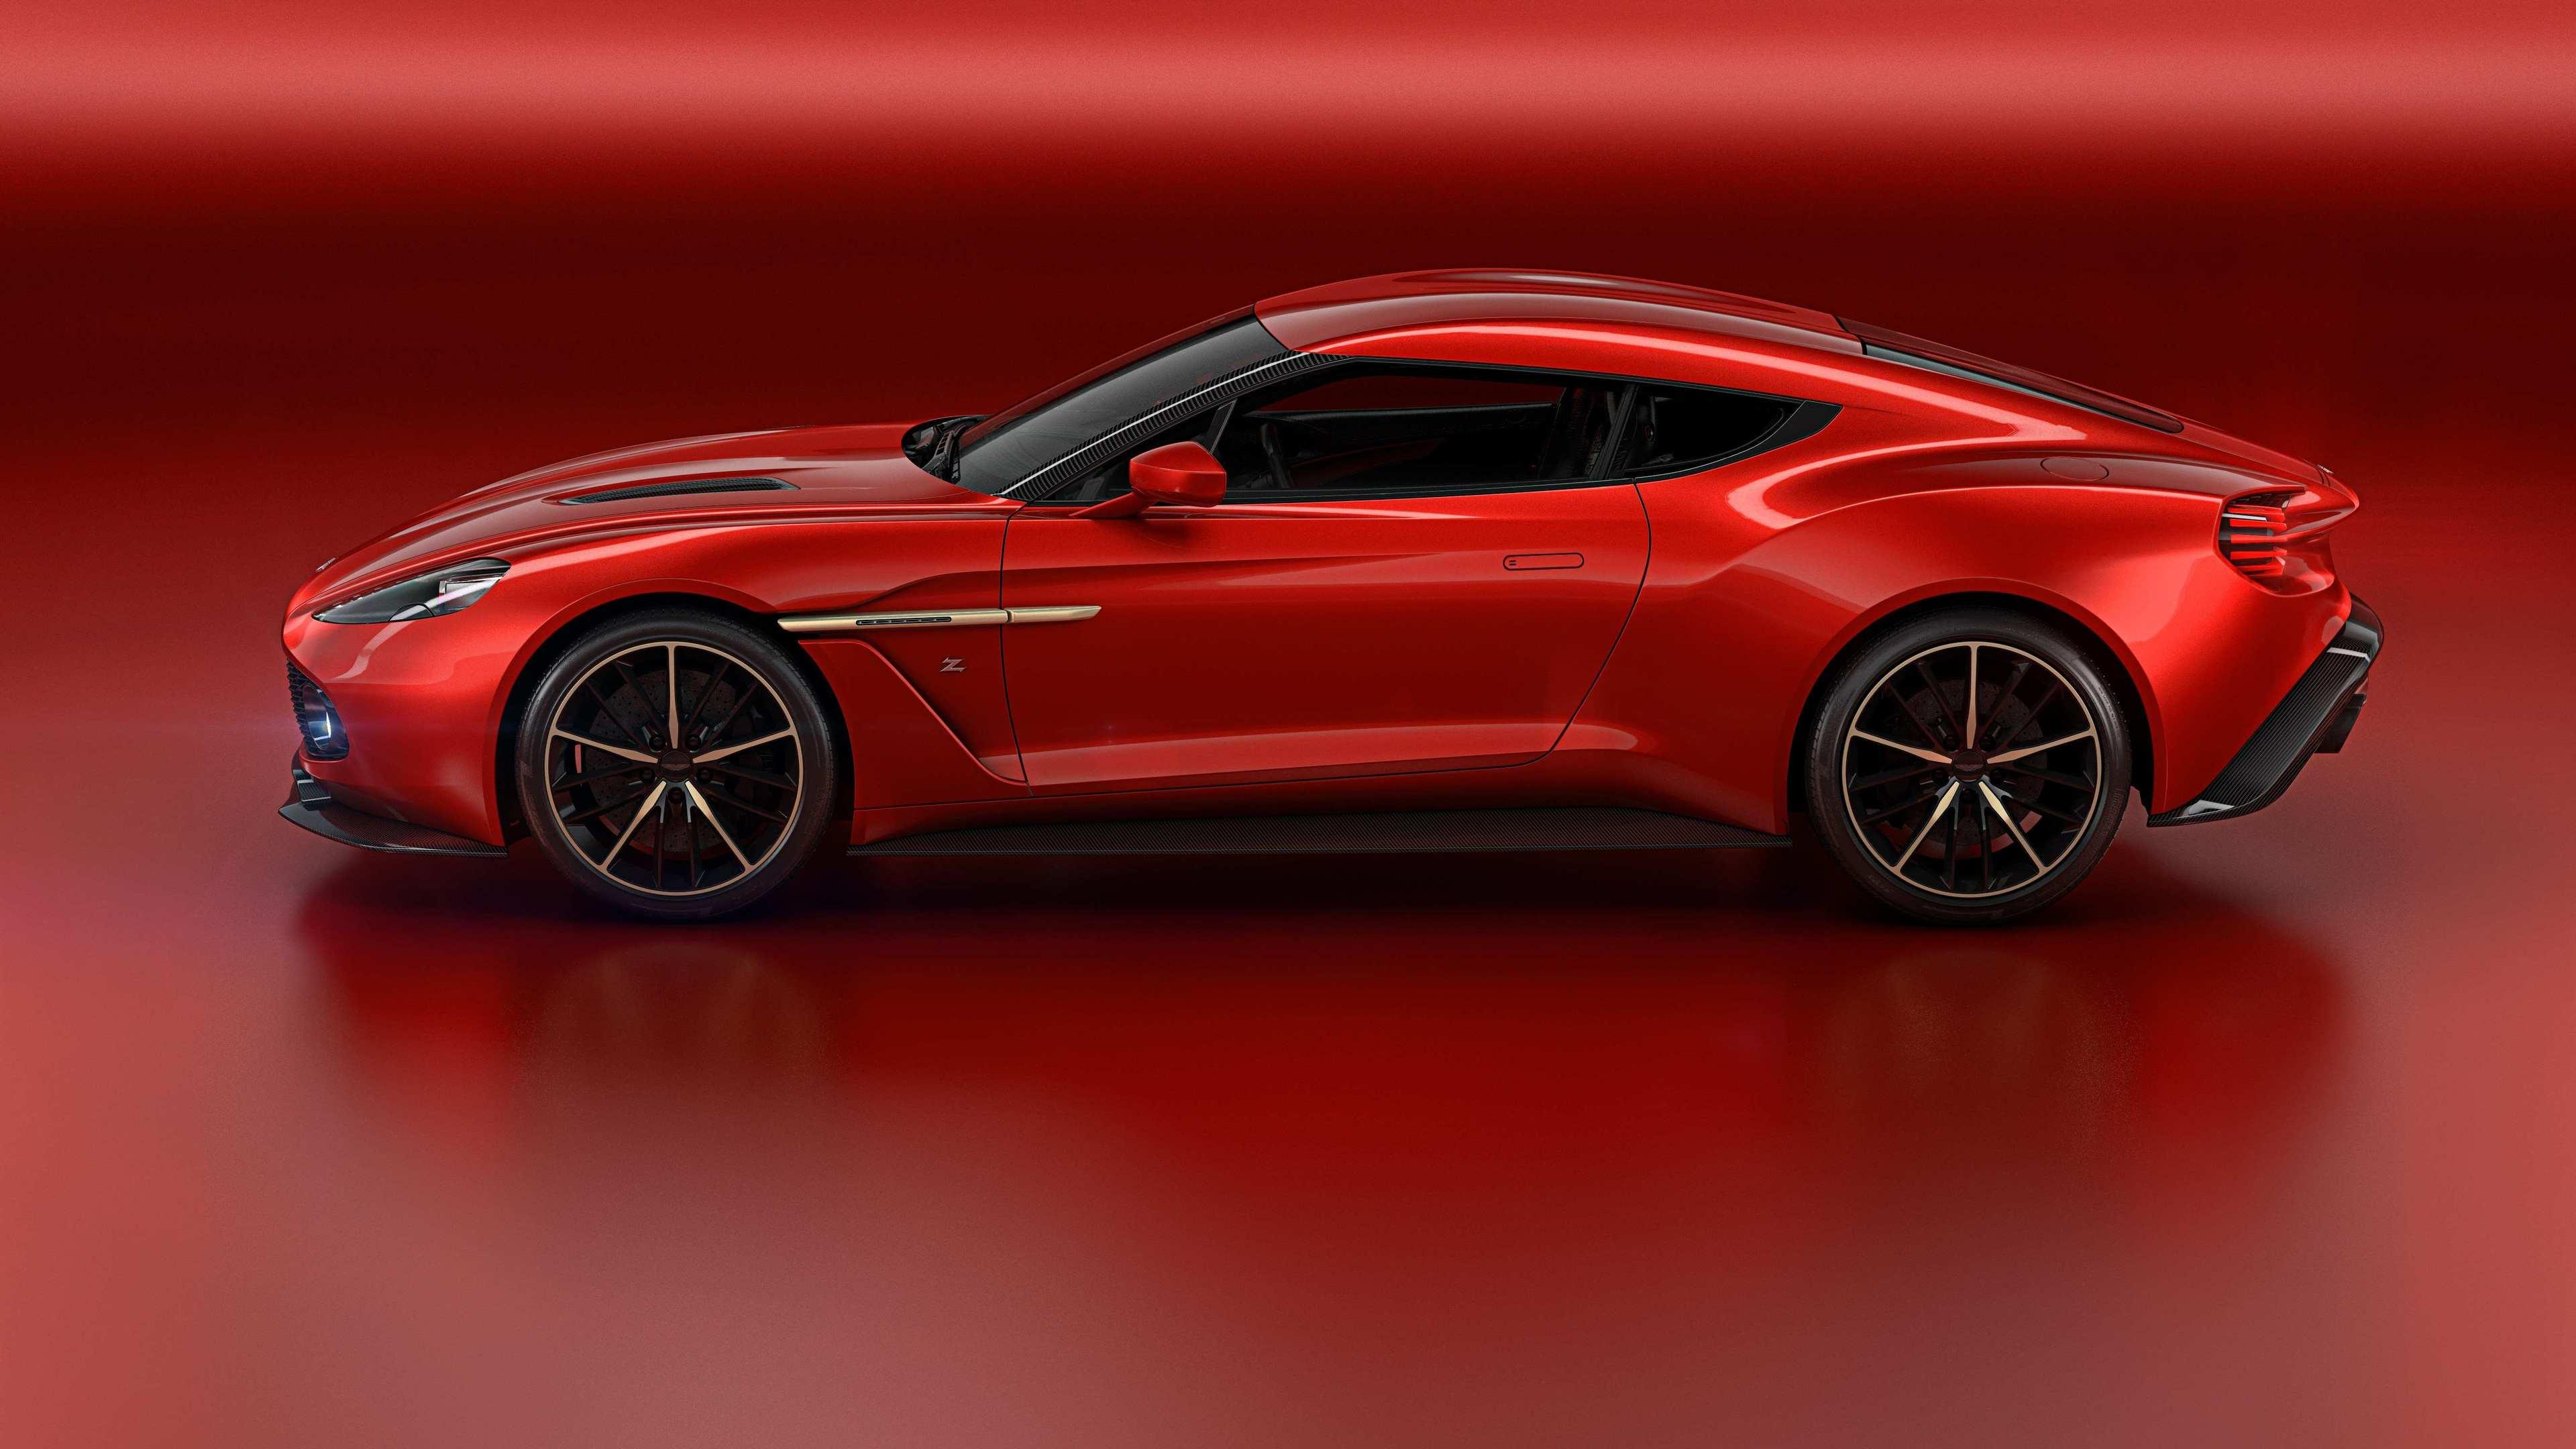 aston martin vanquish zagato concept 1539104572 - Aston Martin Vanquish Zagato Concept - red wallpapers, concept cars wallpapers, cars wallpapers, aston martin wallpapers